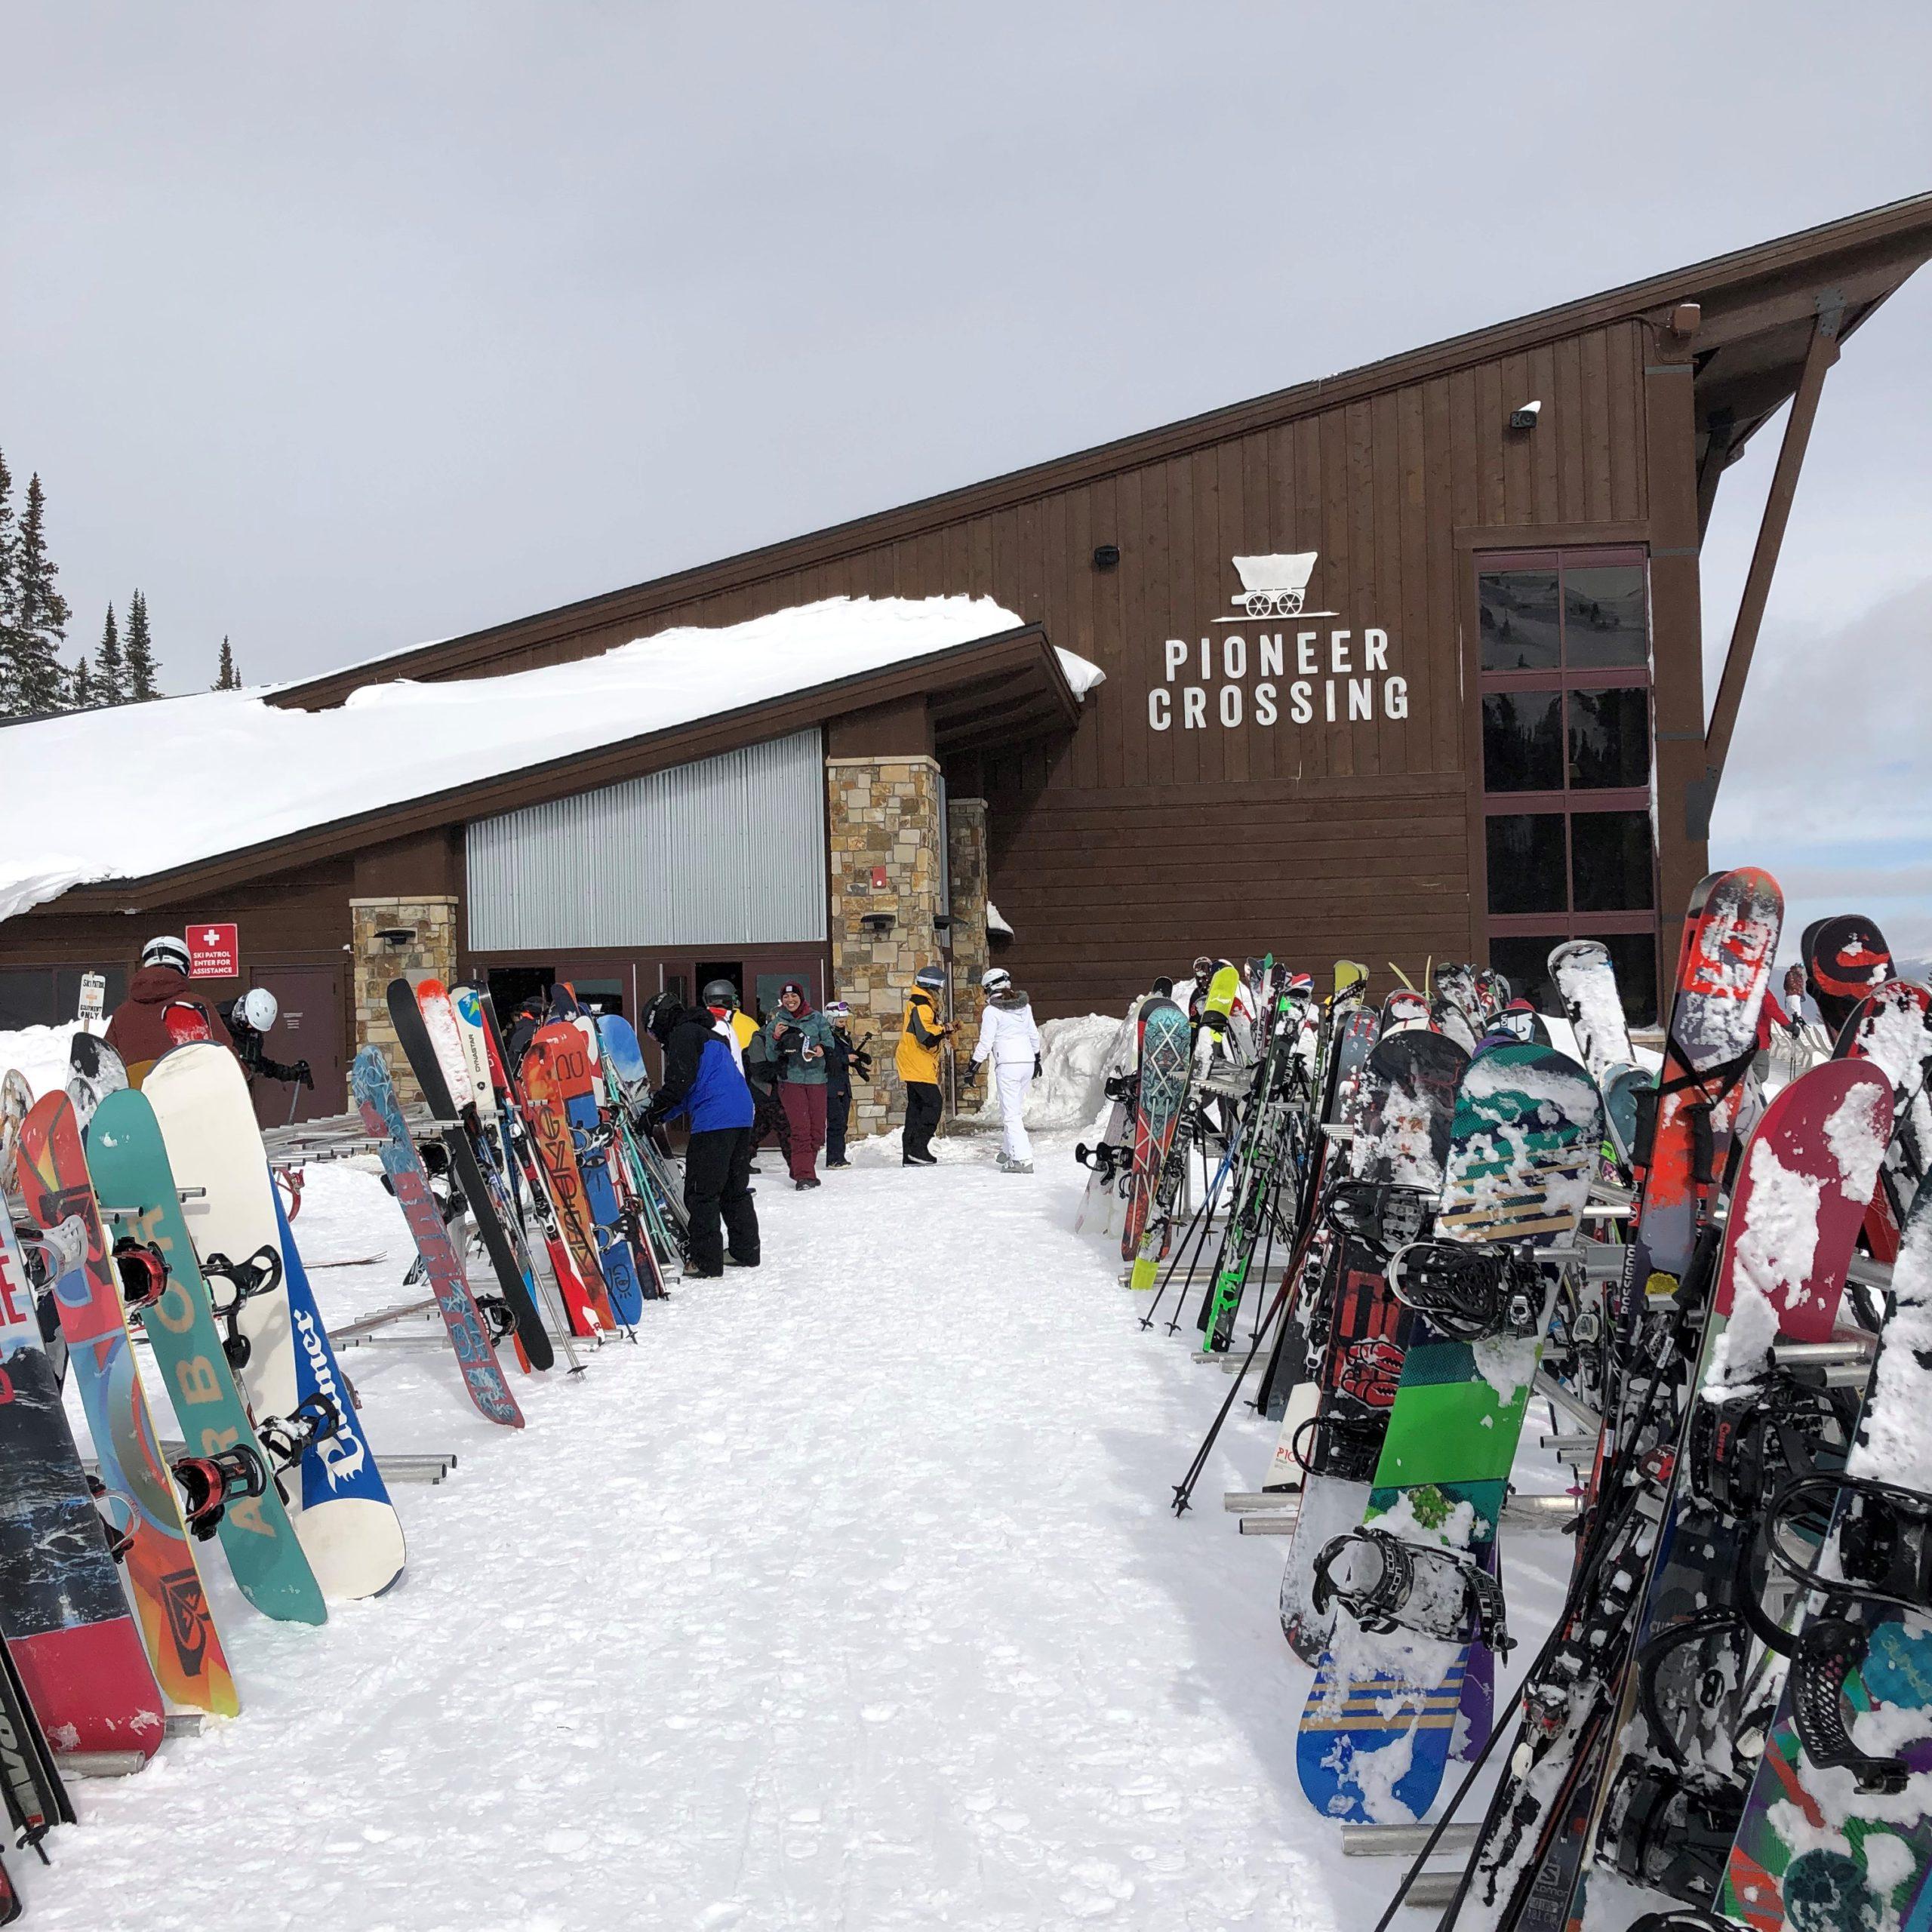 The new Pioneer Crossing mountain restaurant at Breckenridge Ski Resort